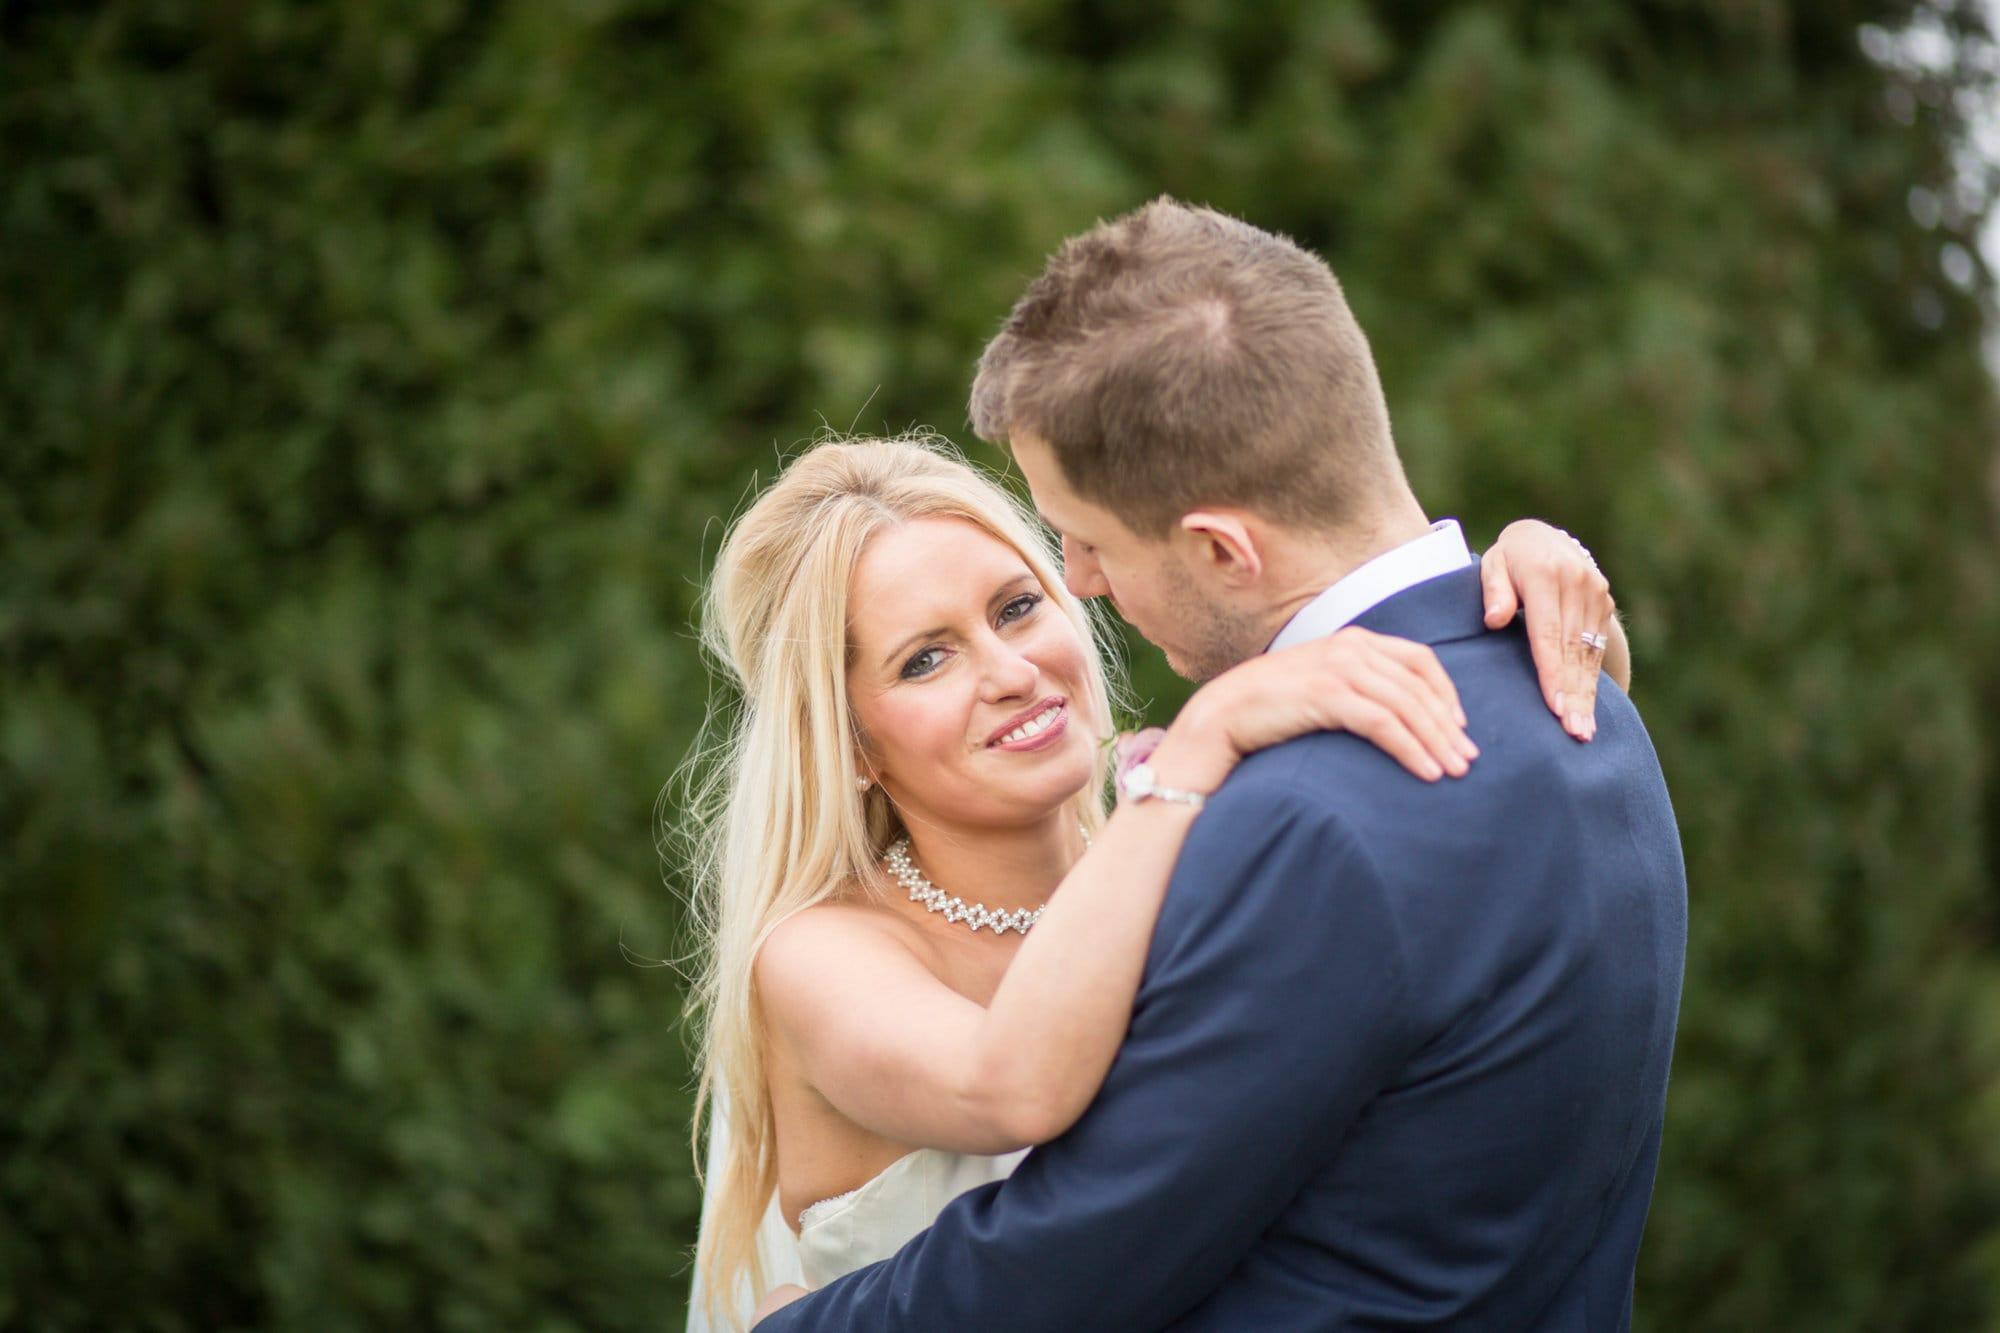 Bride cuddling groom and looking over shoulder in wedding photoshoot in Bromley, Kent